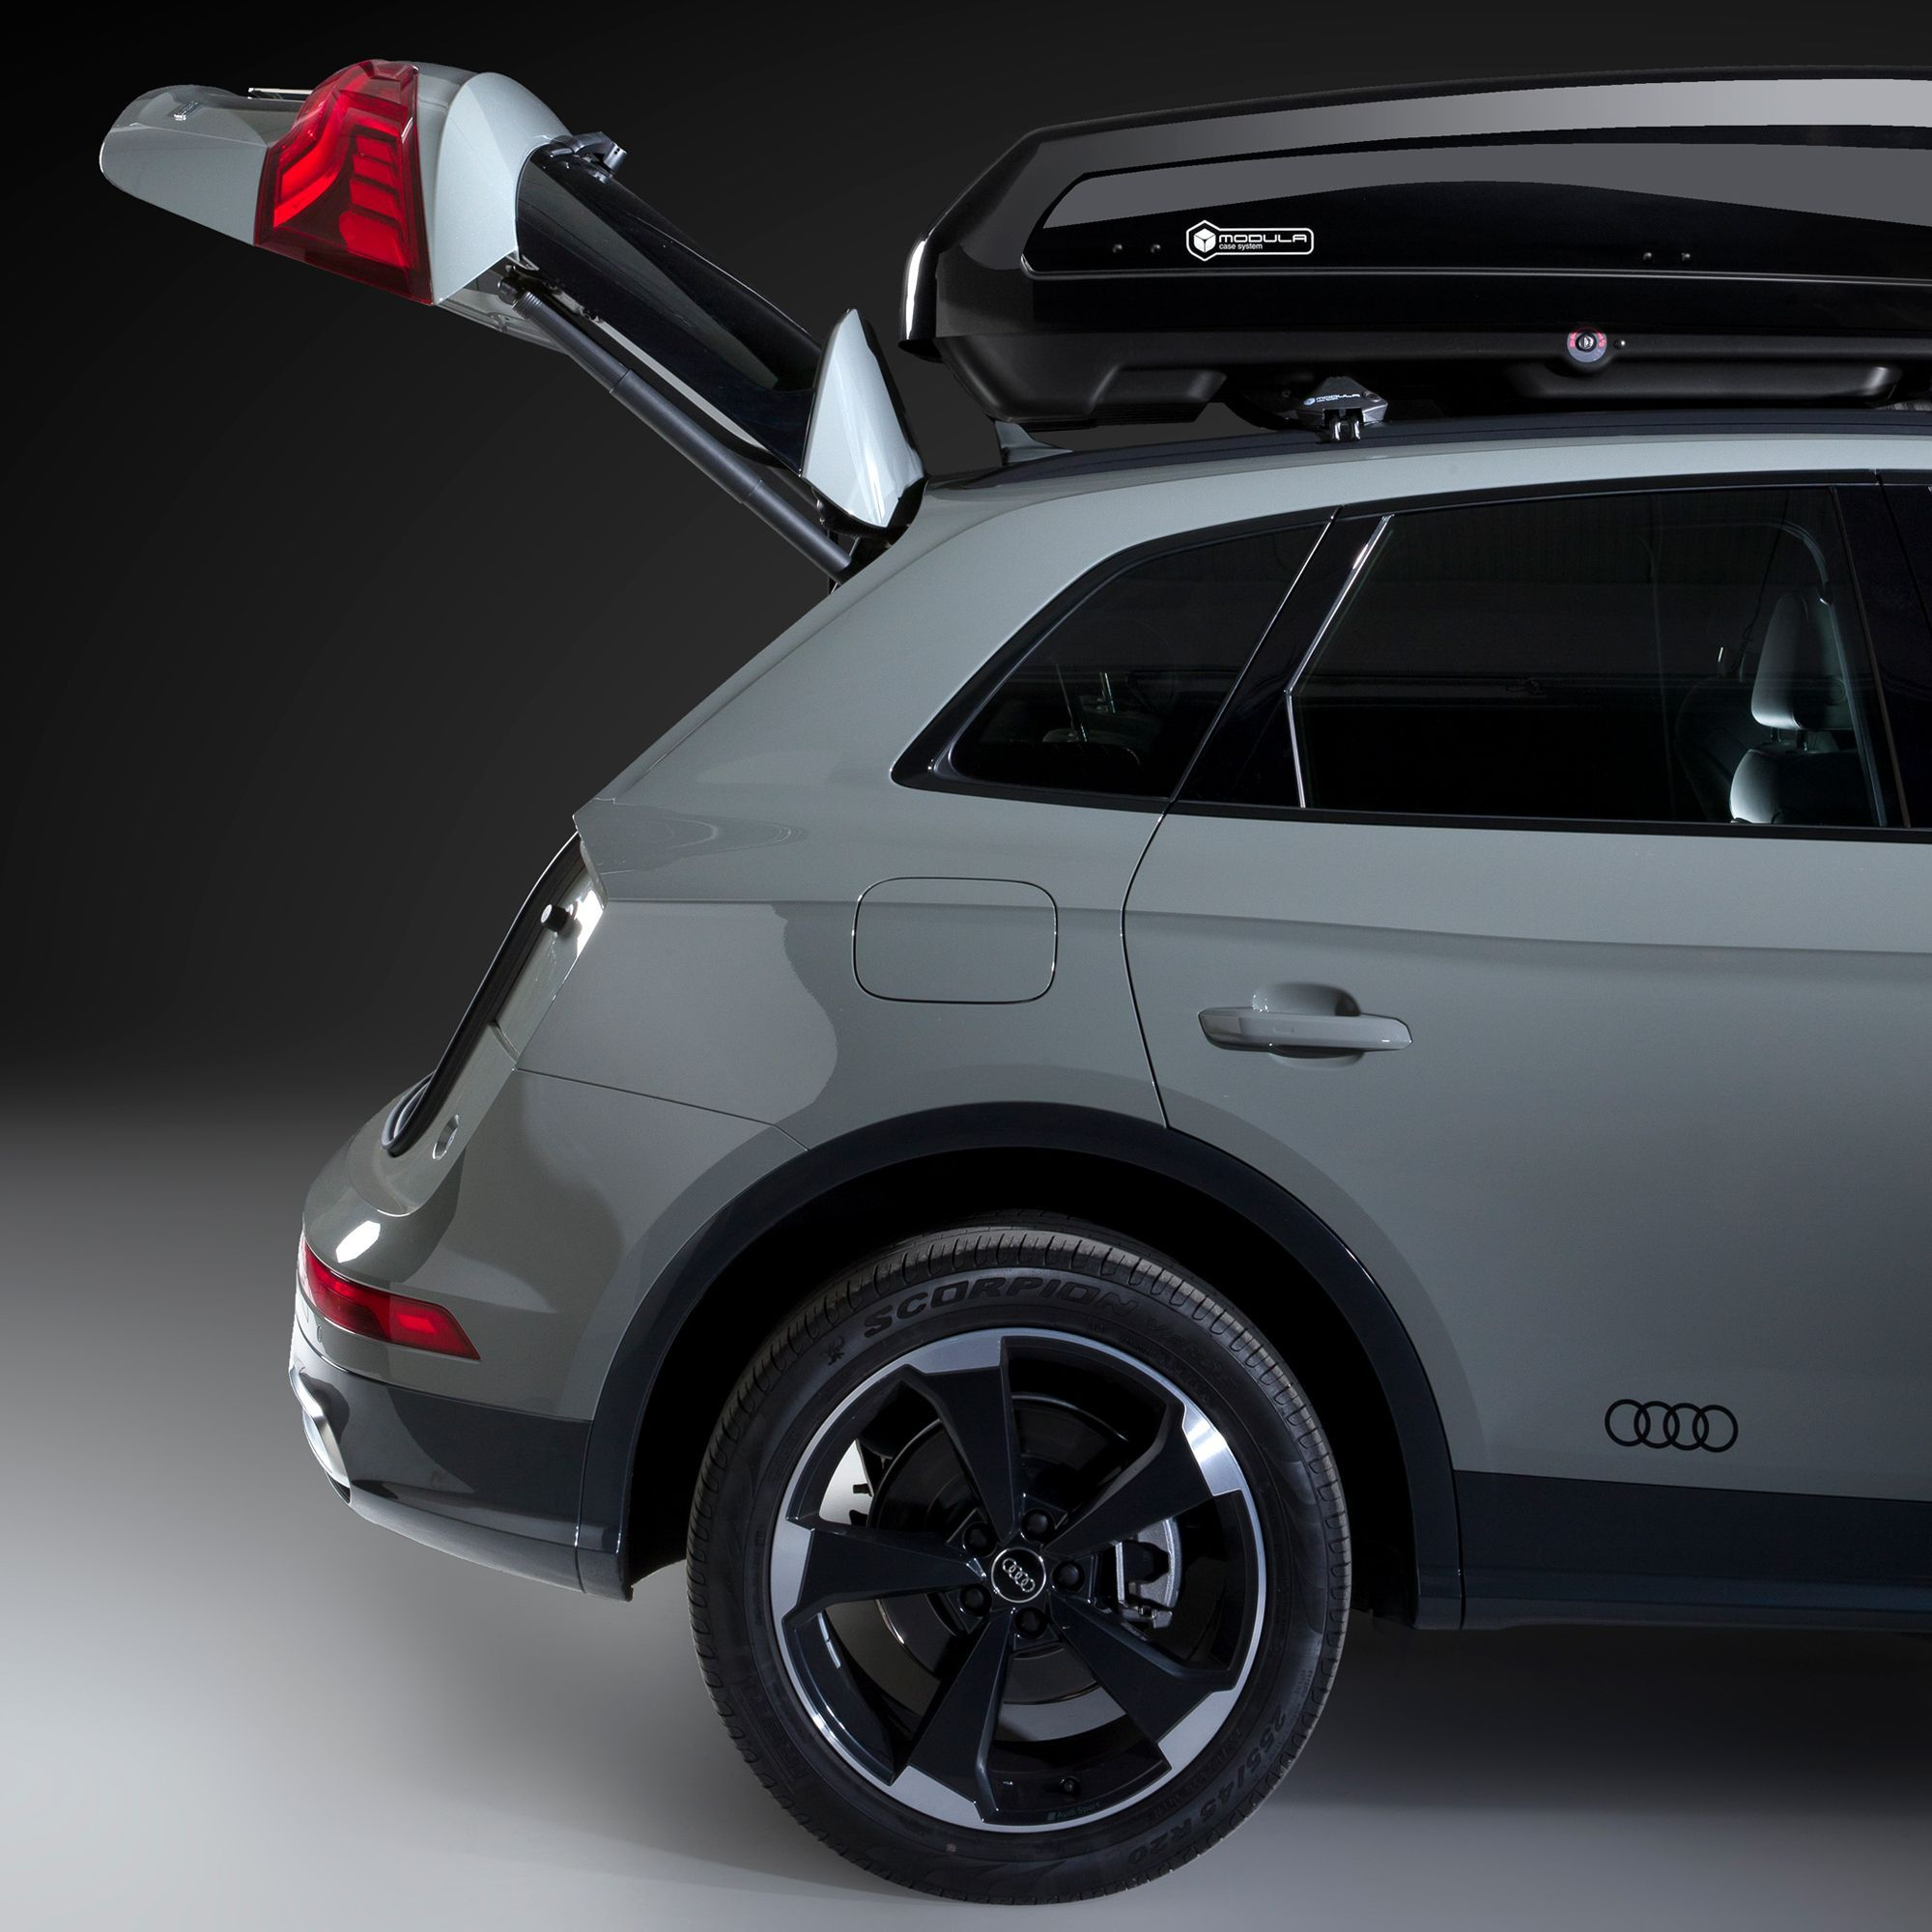 EVO 550L Gloss Black Roof Box | DriveDen UK